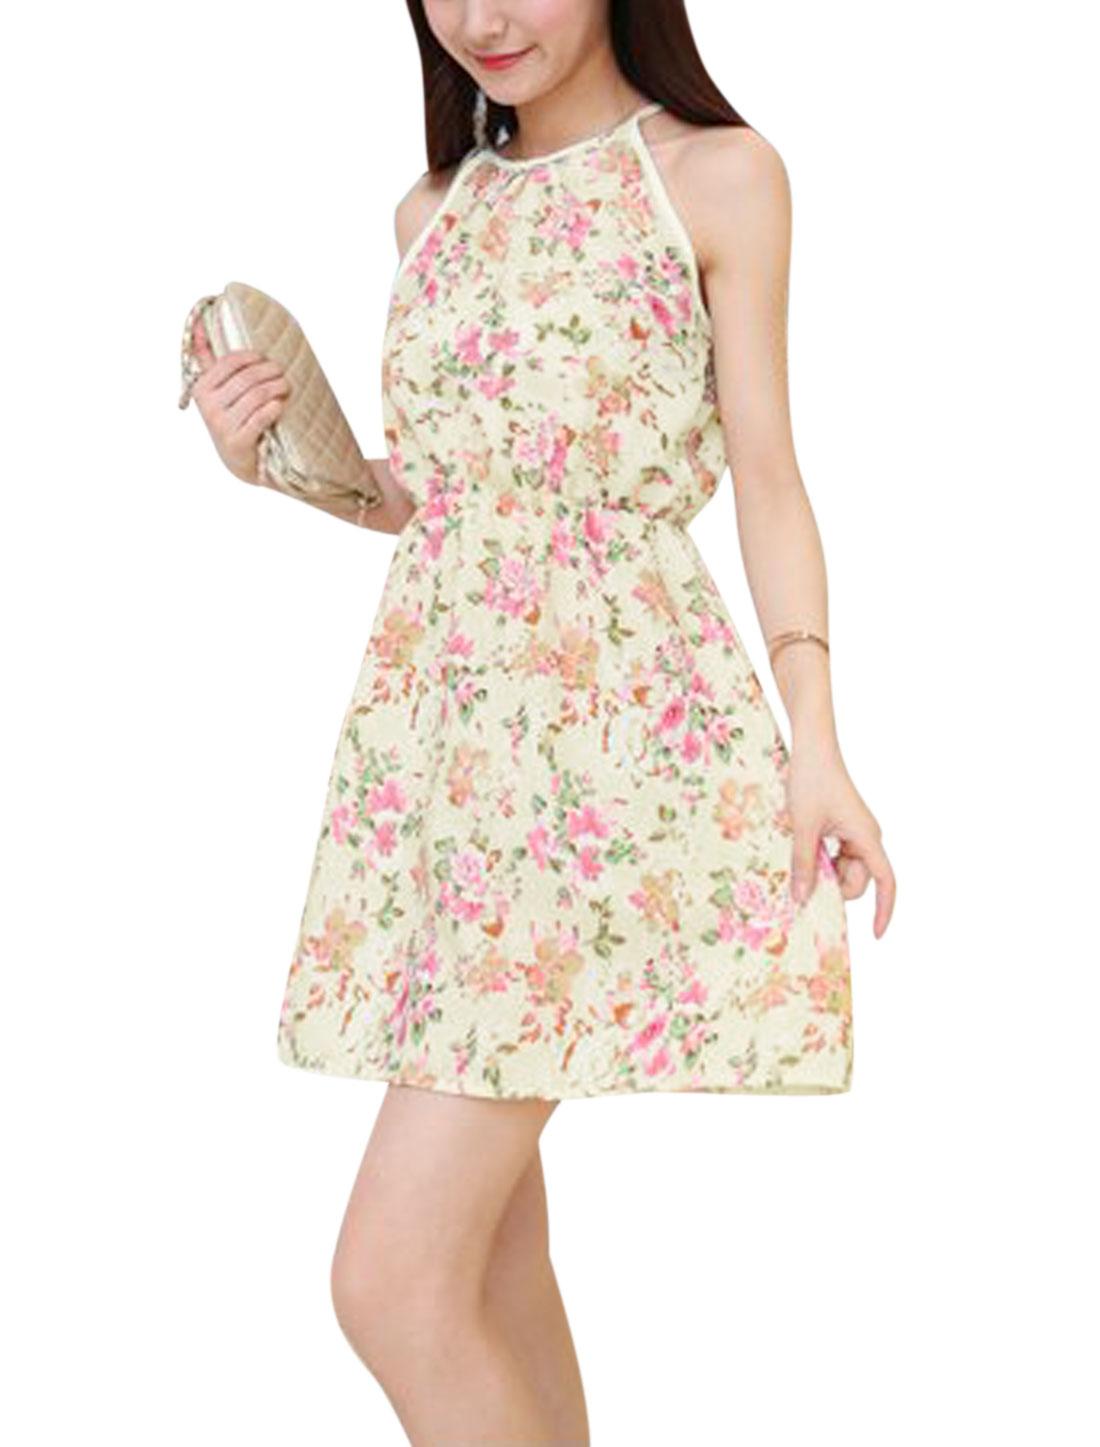 Ladies Halter Neck Sleeveless Flower Prints Unlined Sundress Beige XS